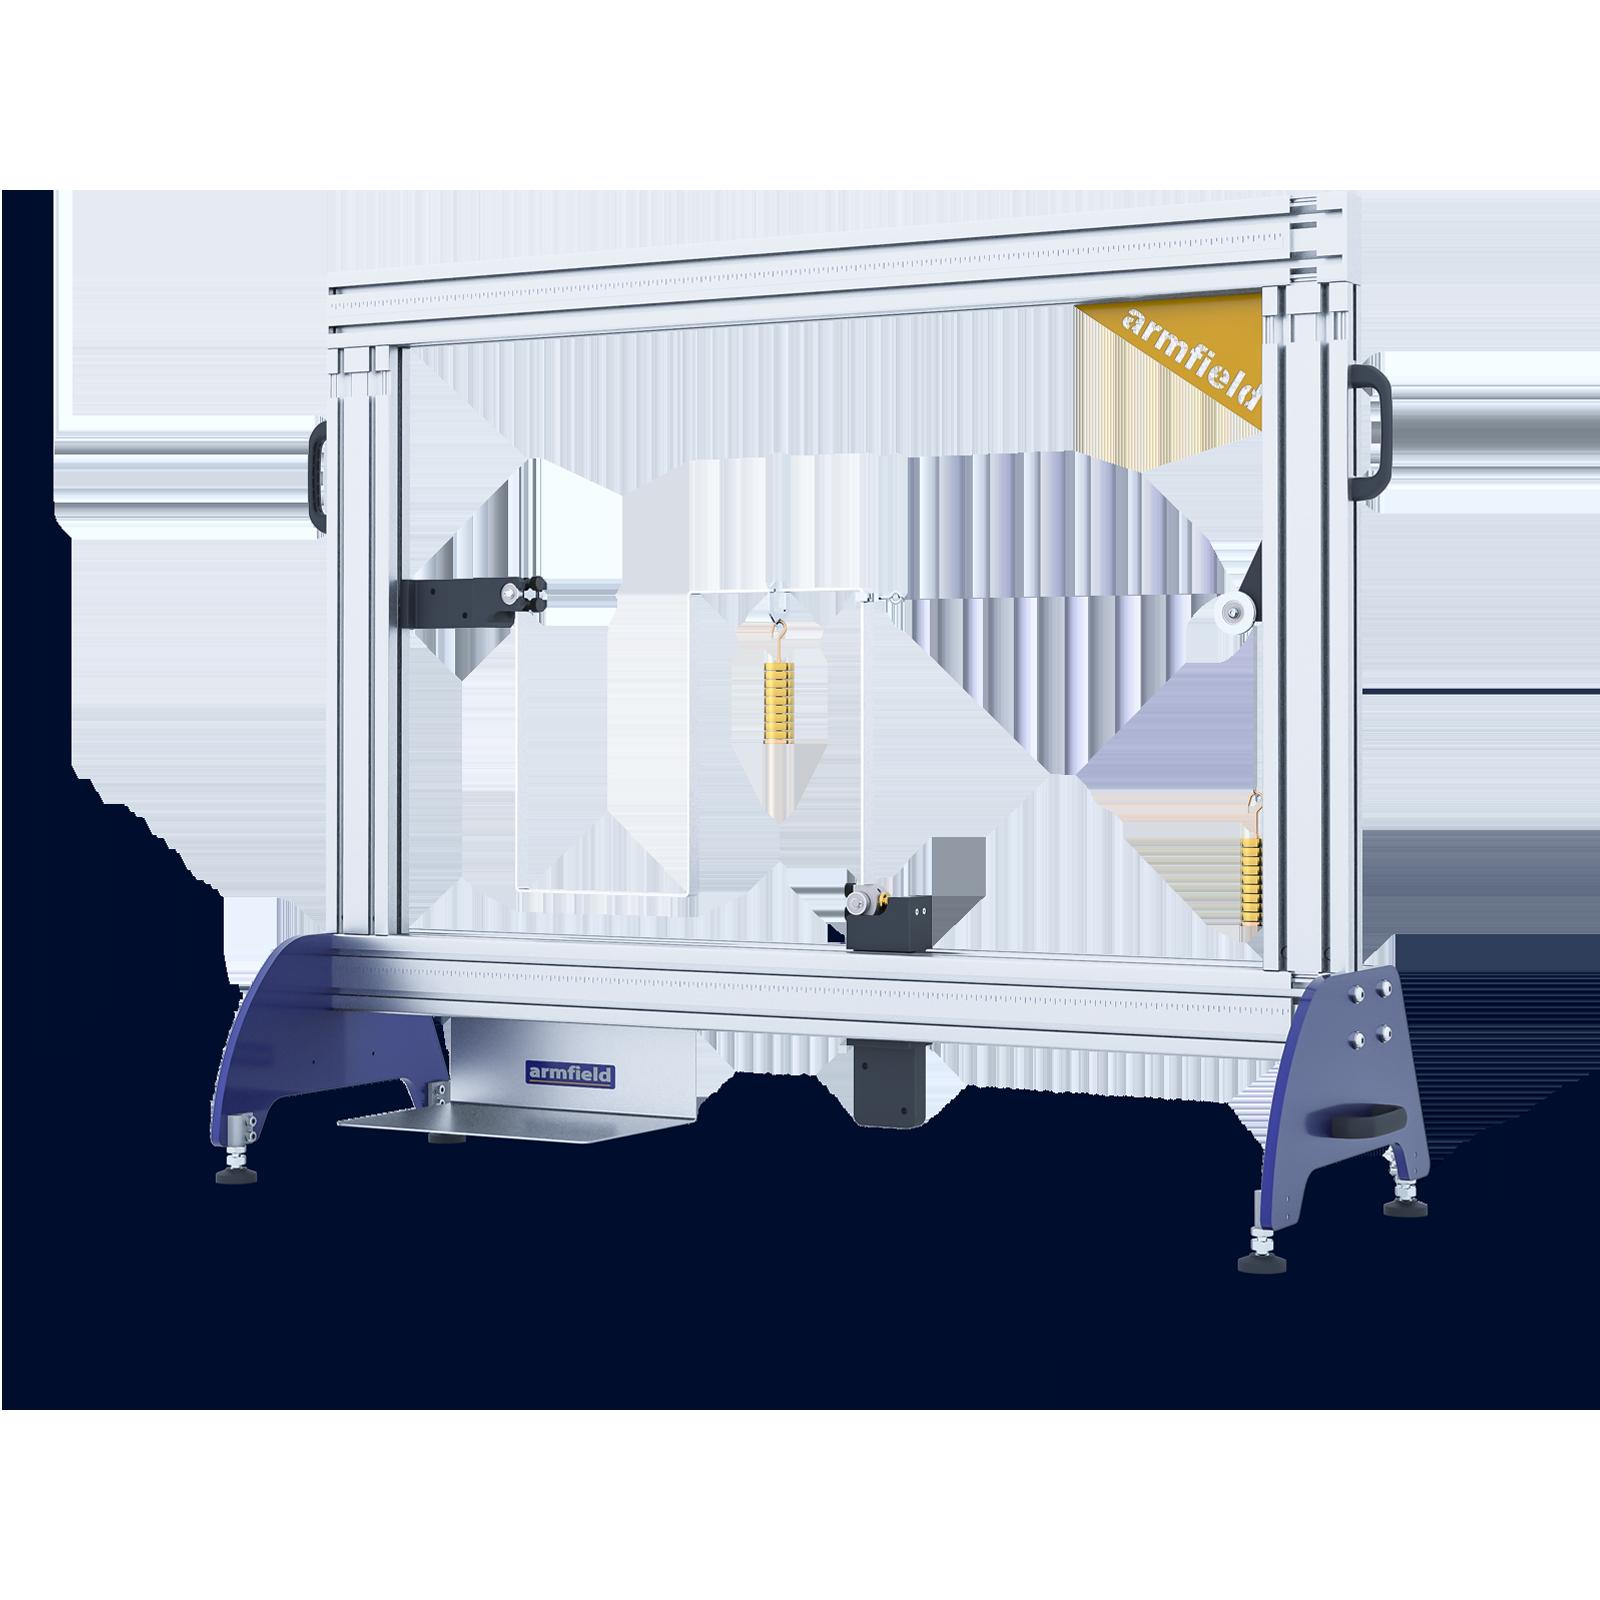 SV401 – Deflection of a Frame